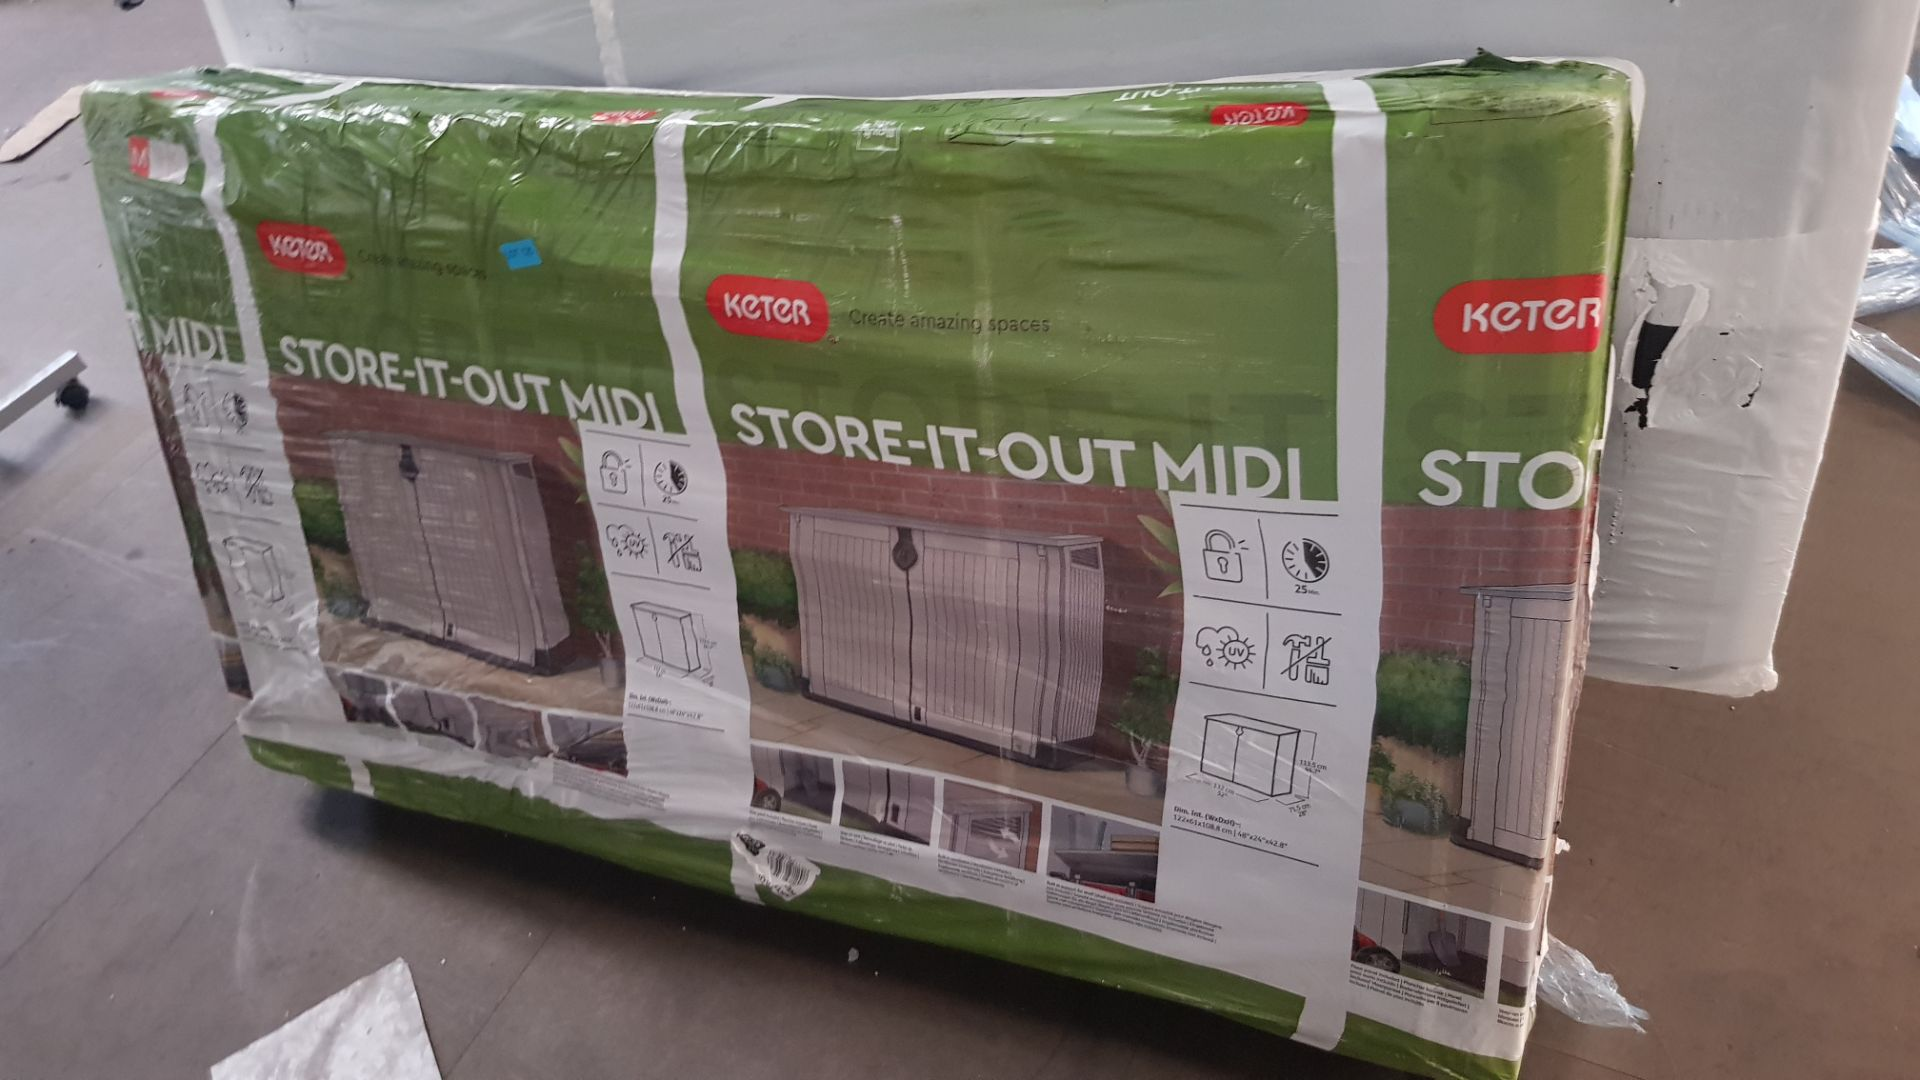 (P1) 1x Keter Store It Out Midi 880L. RRP £120.00. (H110x W74x L130cm) - Image 3 of 5